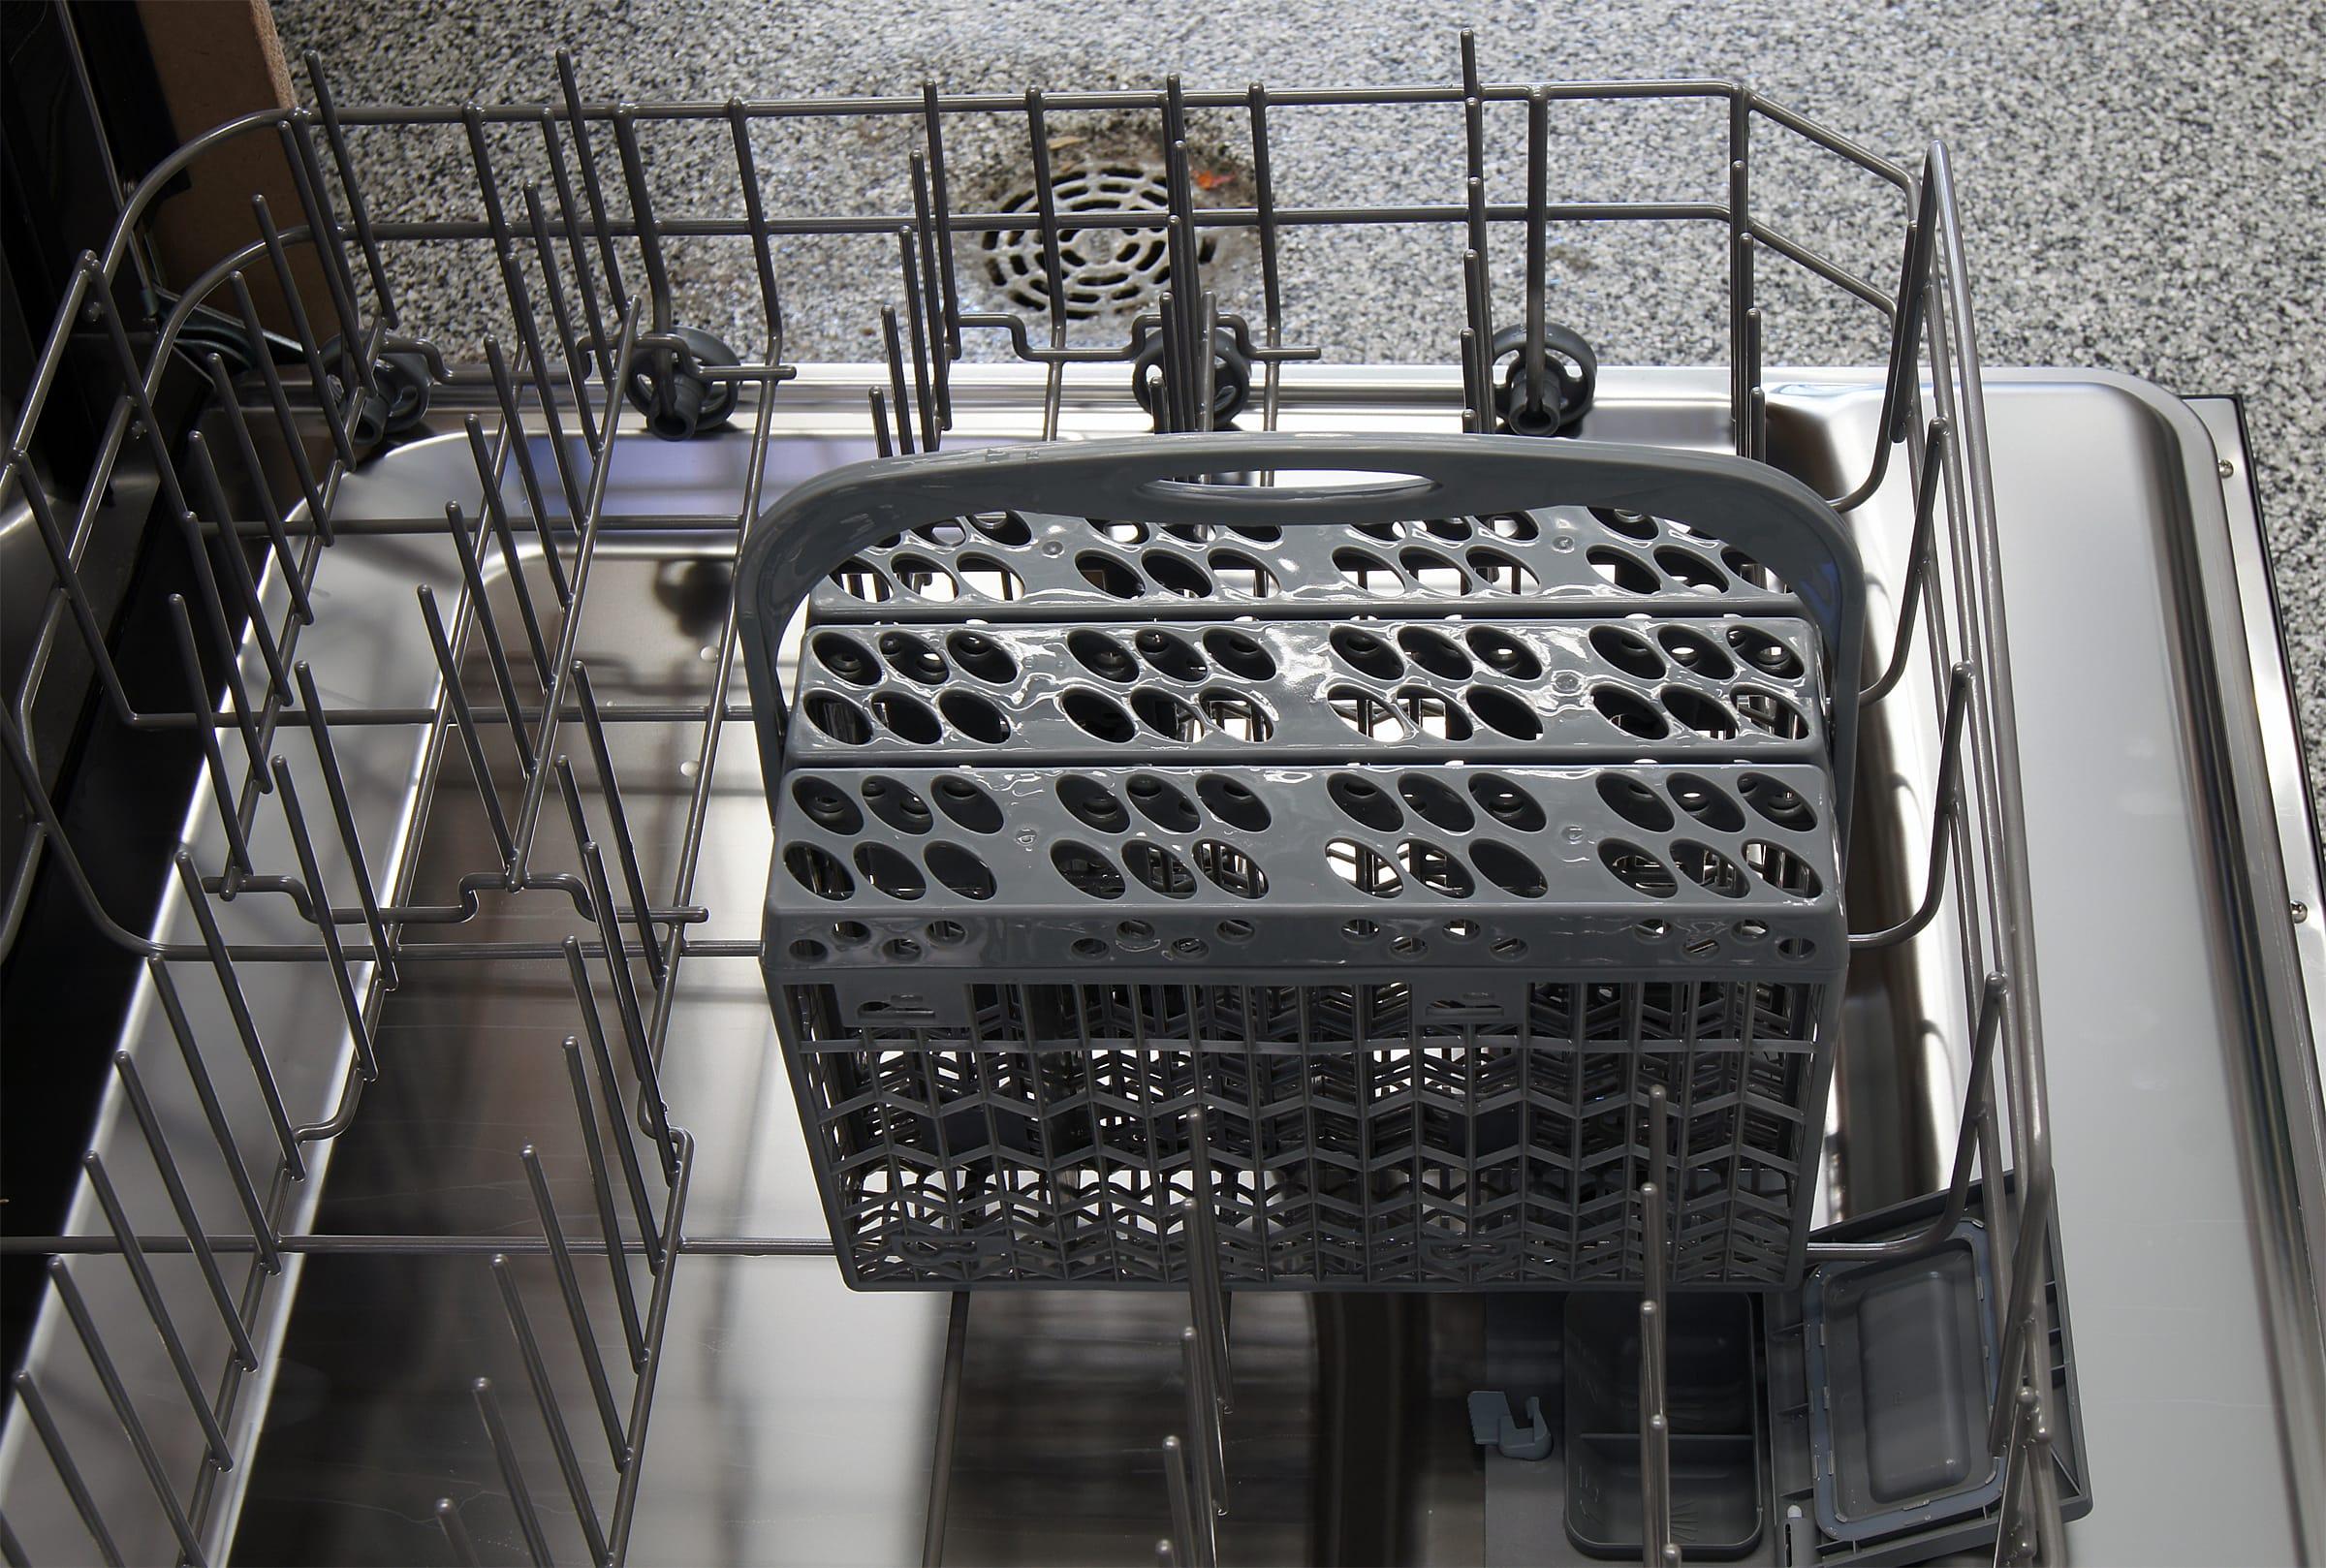 Fagor LFA-75IT cutlery basket